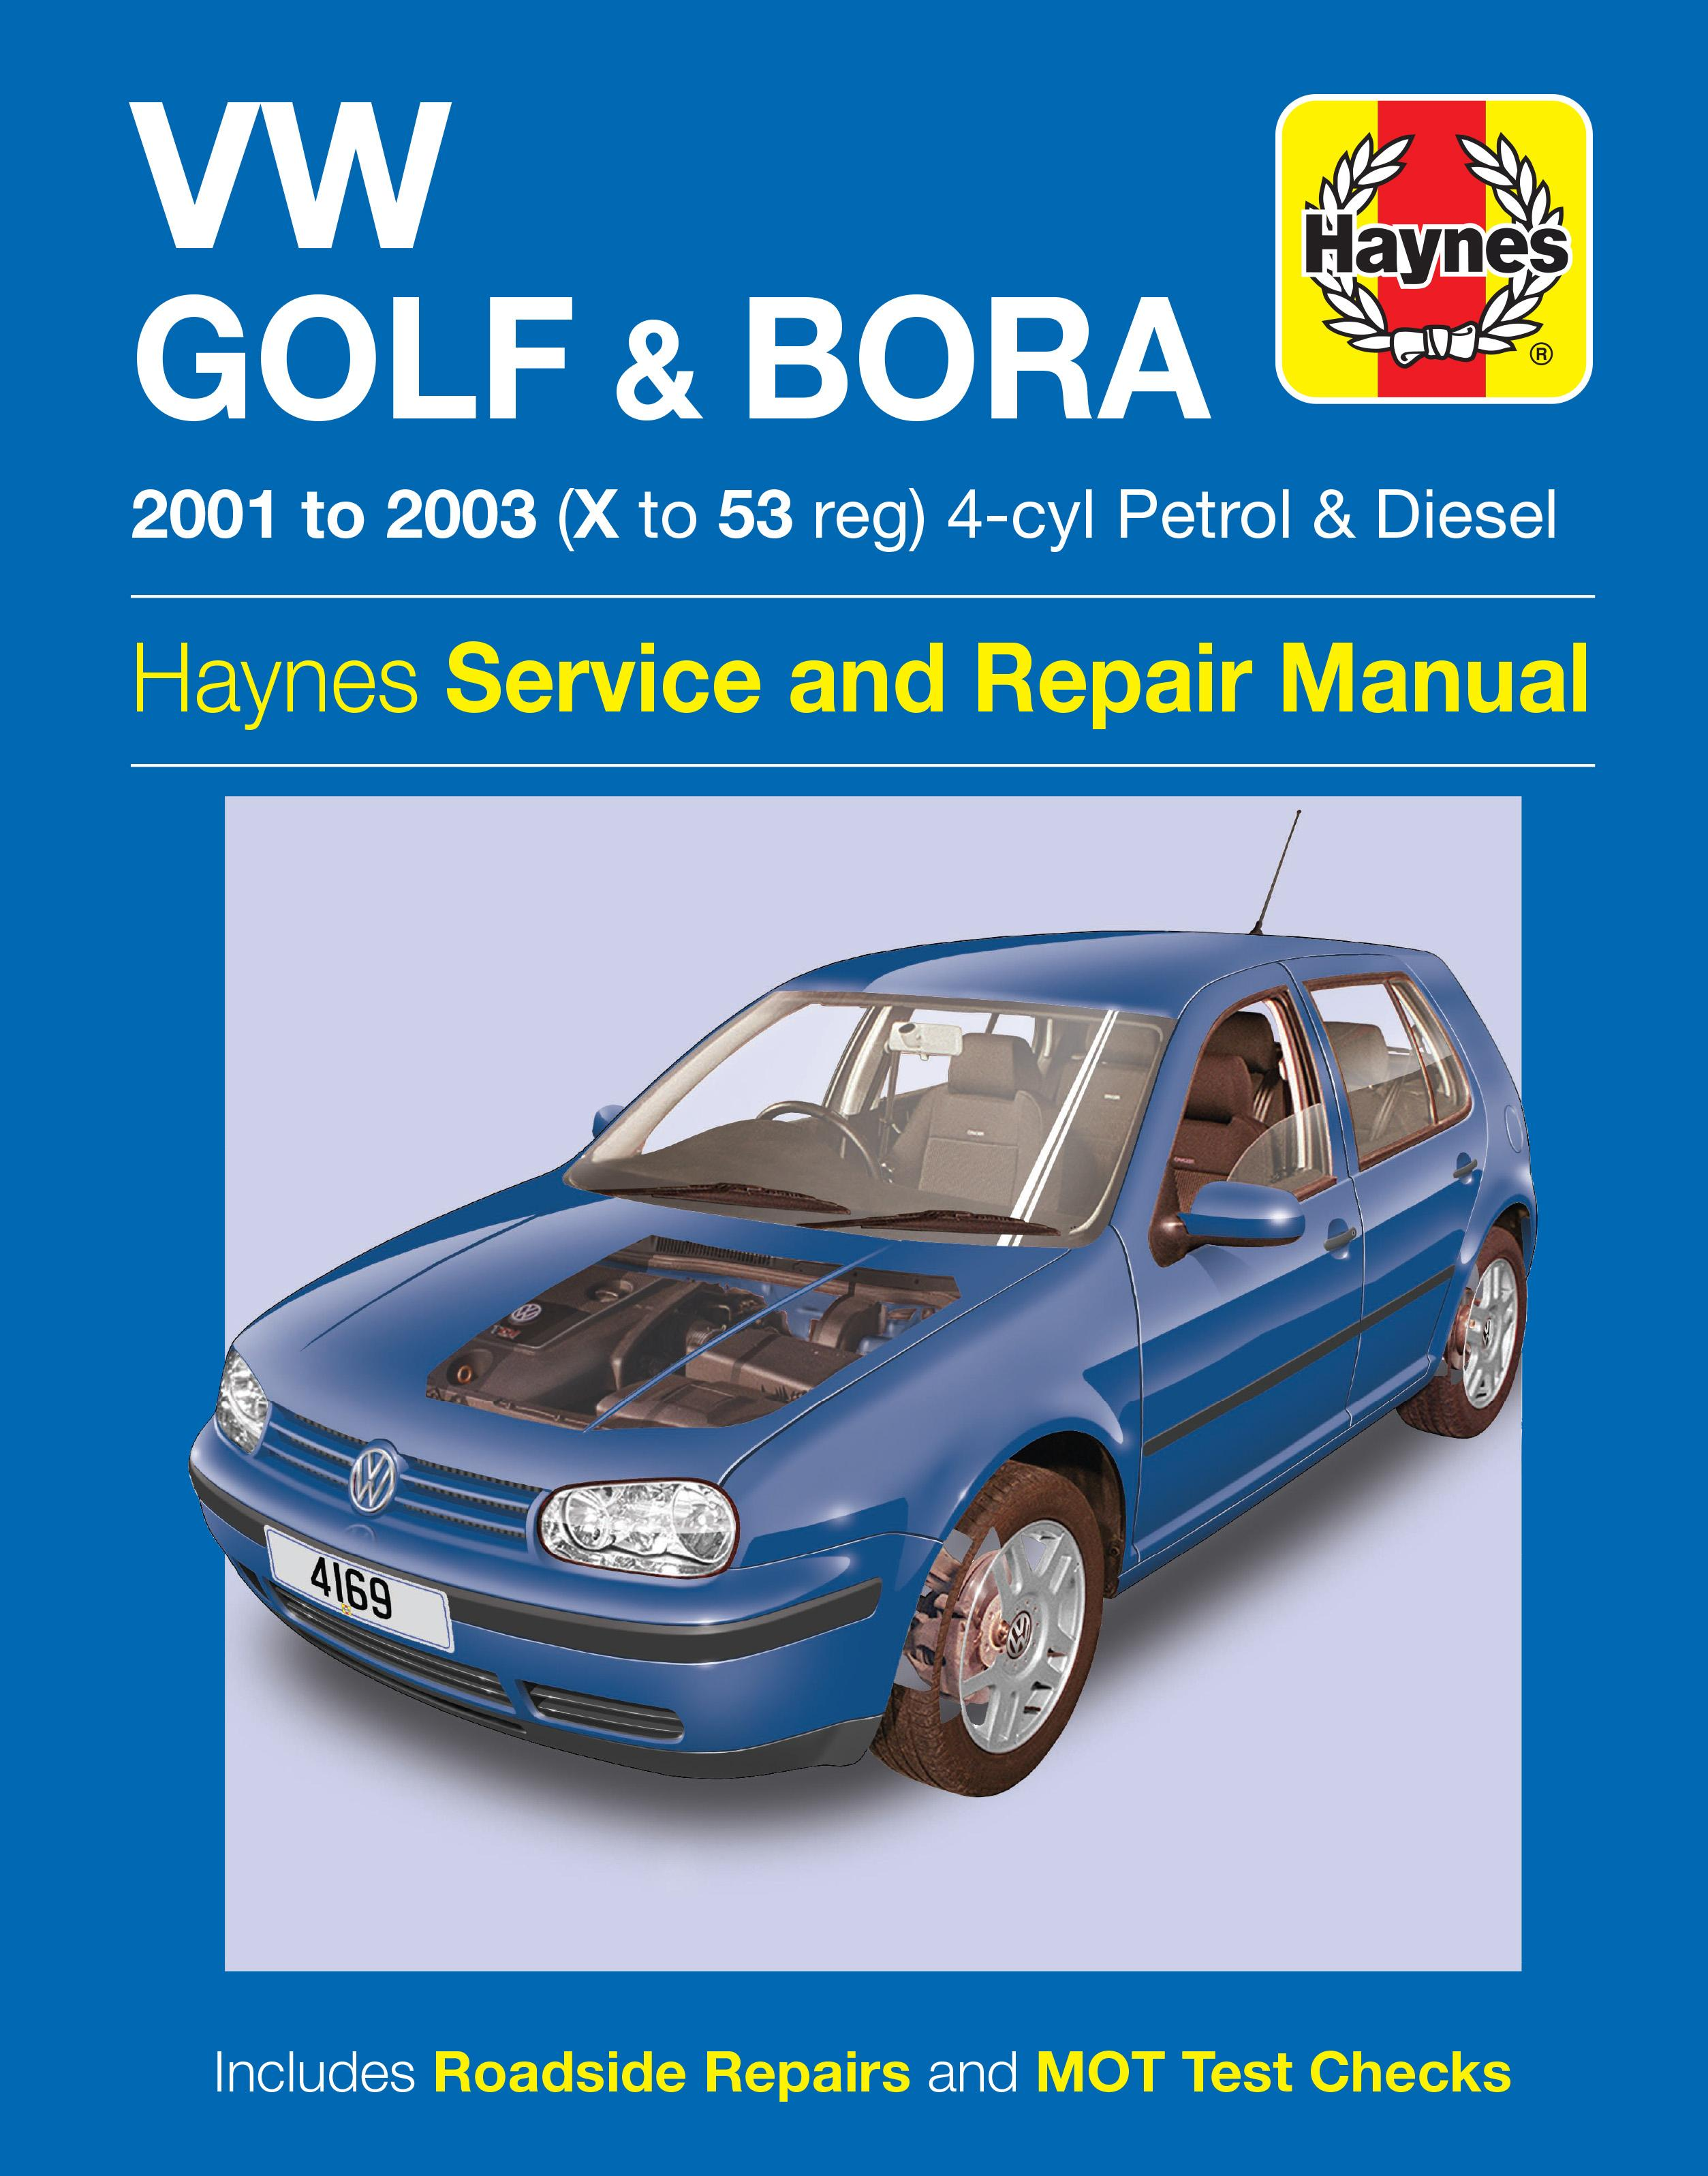 haynes vw golf bora 01 03 manua rh halfords com 2007 Volkswagen Jetta Interior Volkswagen Jetta Spoiler